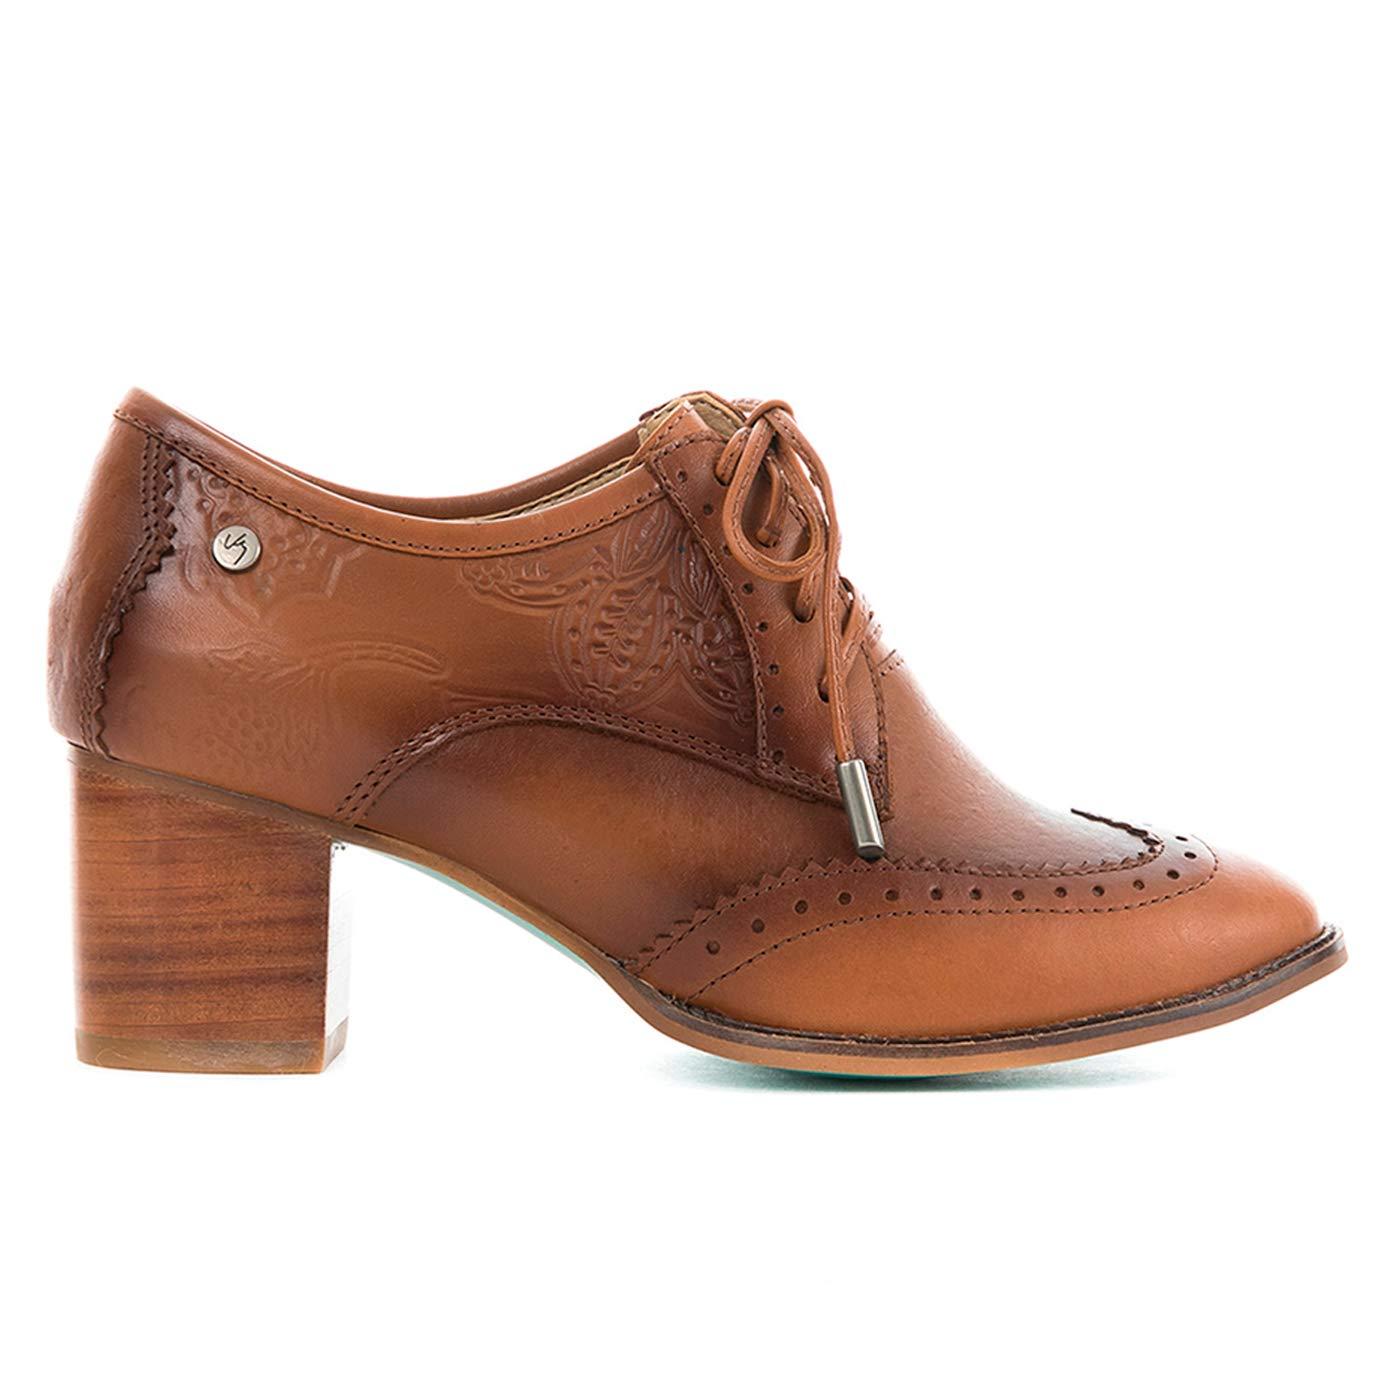 VELEZ 23554 Women Colombian Leather Heels Oxford Shoes | Zapatos Oxford de Cuero Genuino Colombiano para Mujer Brown/Black 36